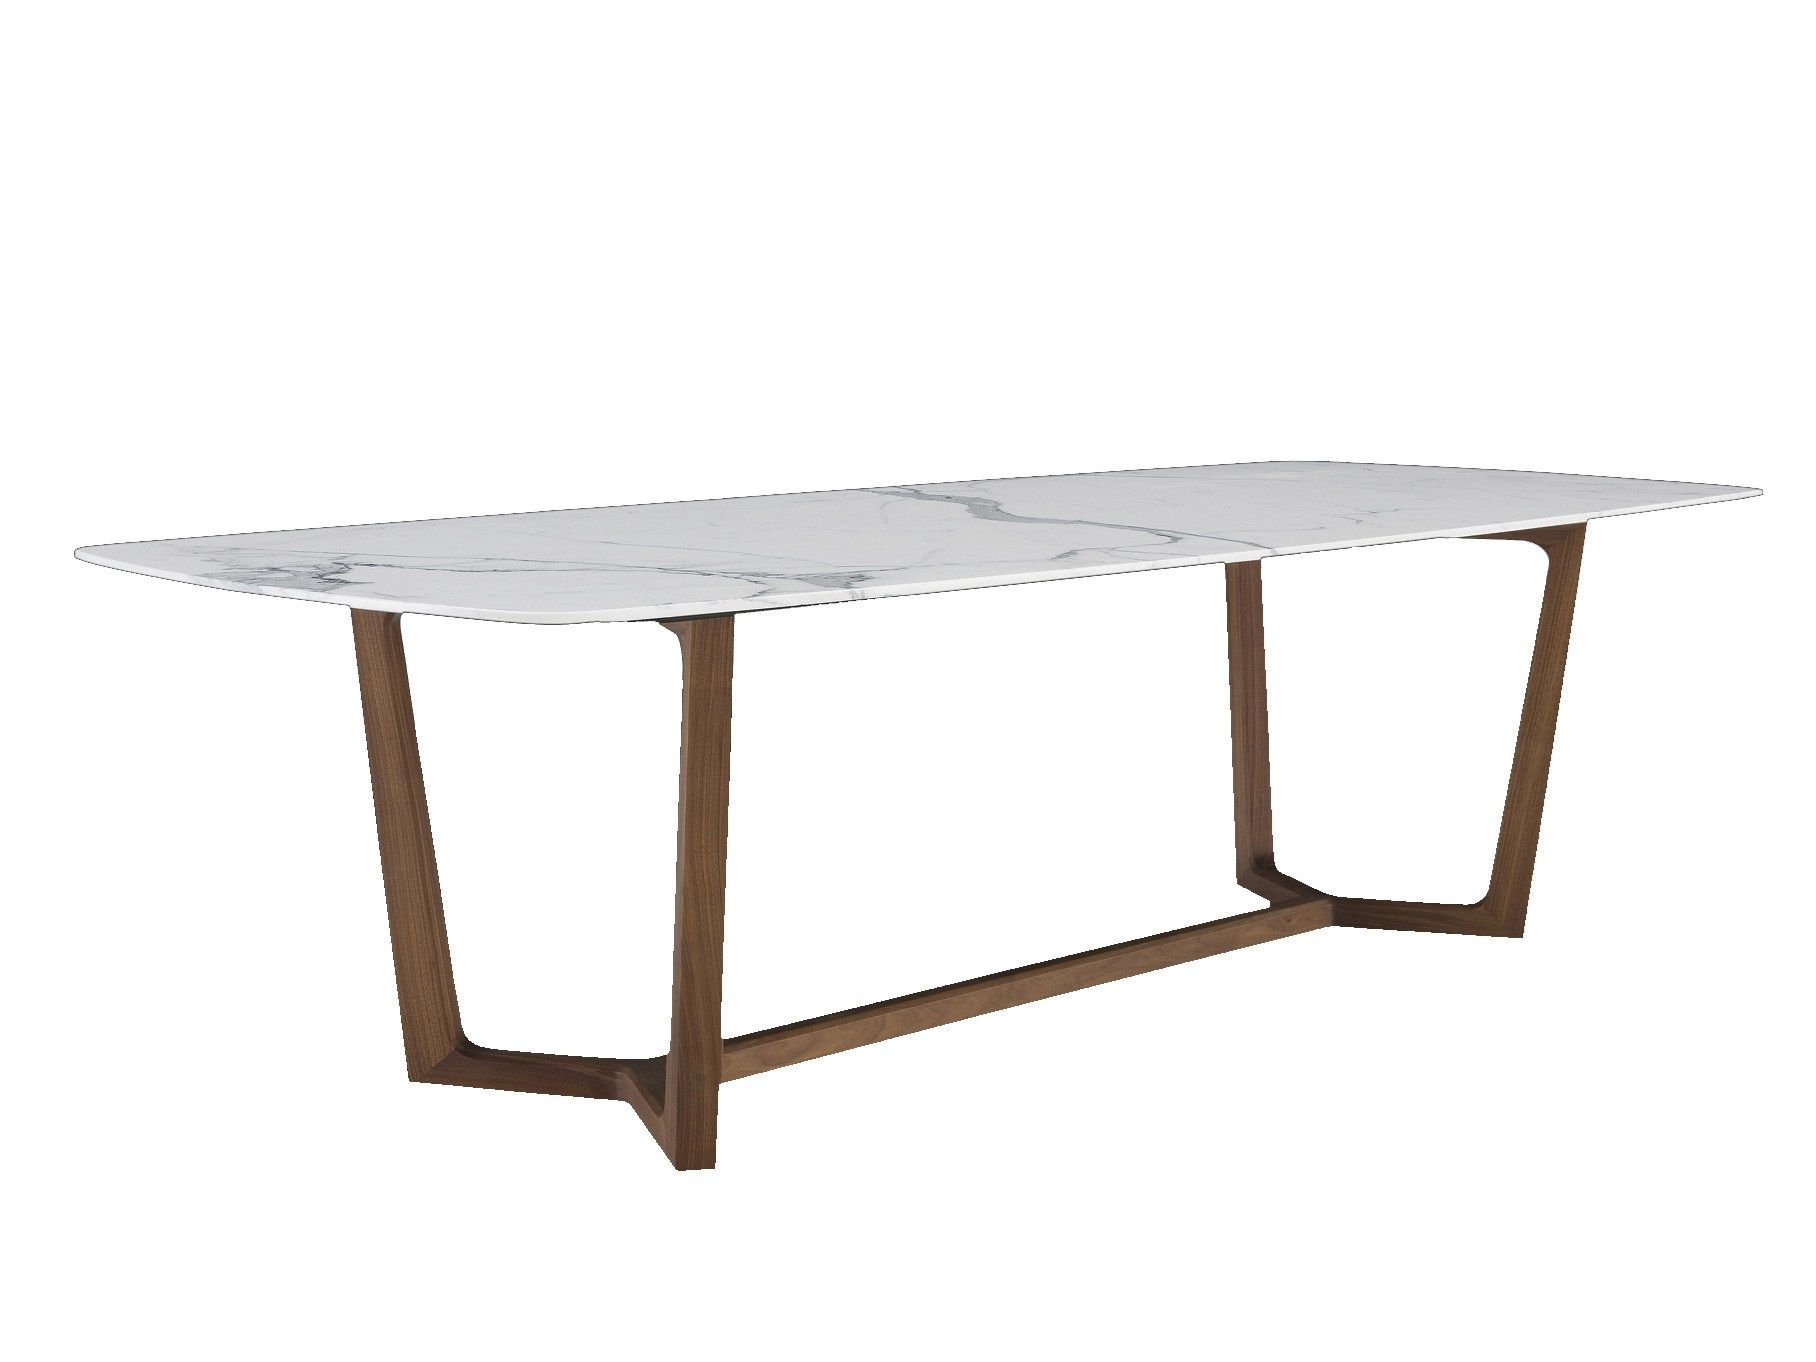 Modern Diningroom Furniture Ash Solid Wood Legs Marble Dining Table Base Marble Top Dining Table Dining Table Marble Dining Table Black